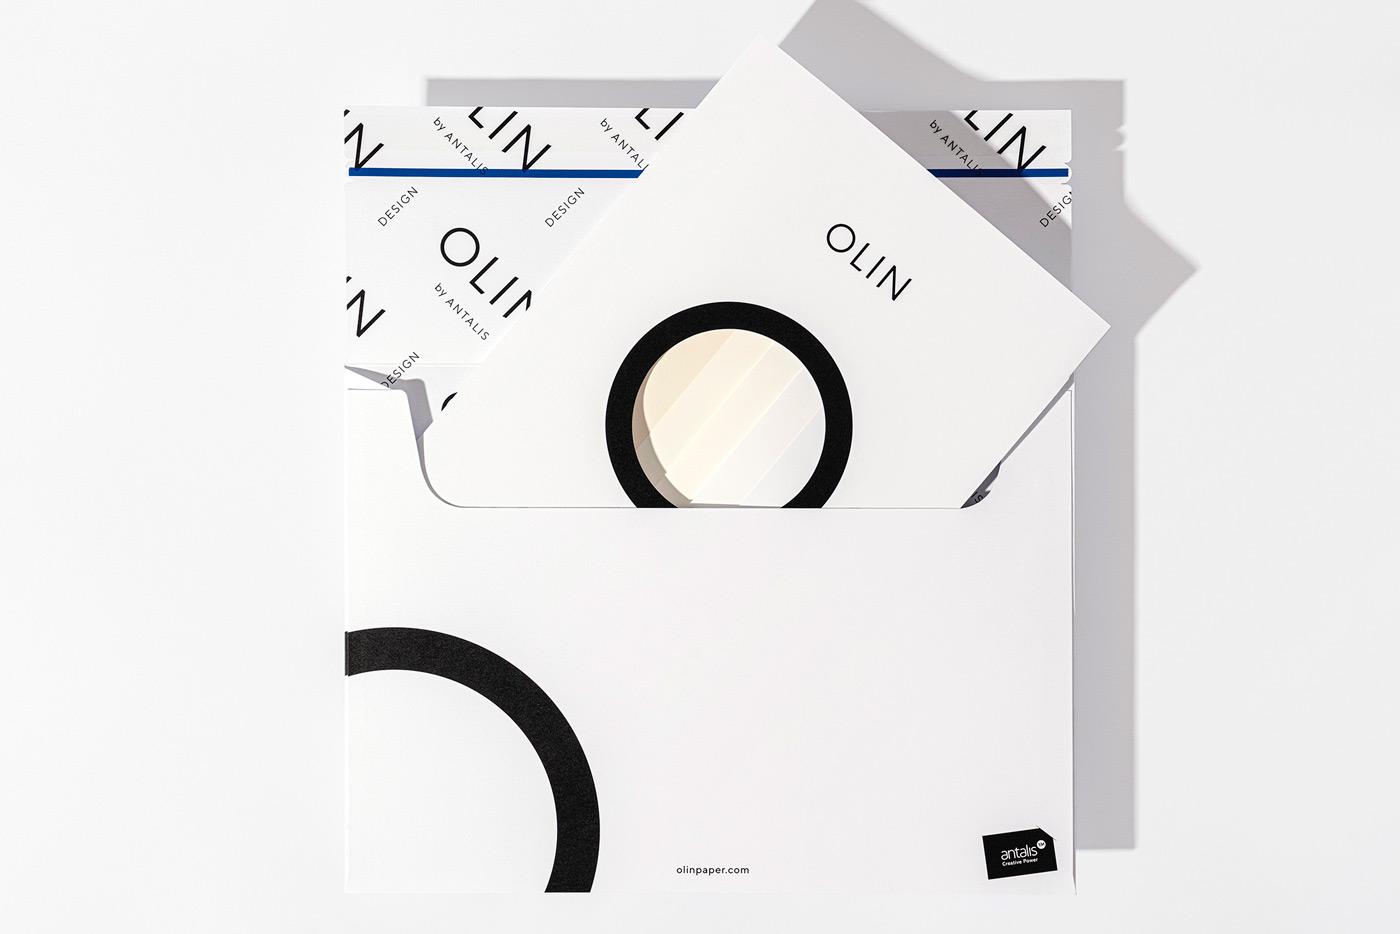 Design & Practice Rebrands Olin Paper by Antalis